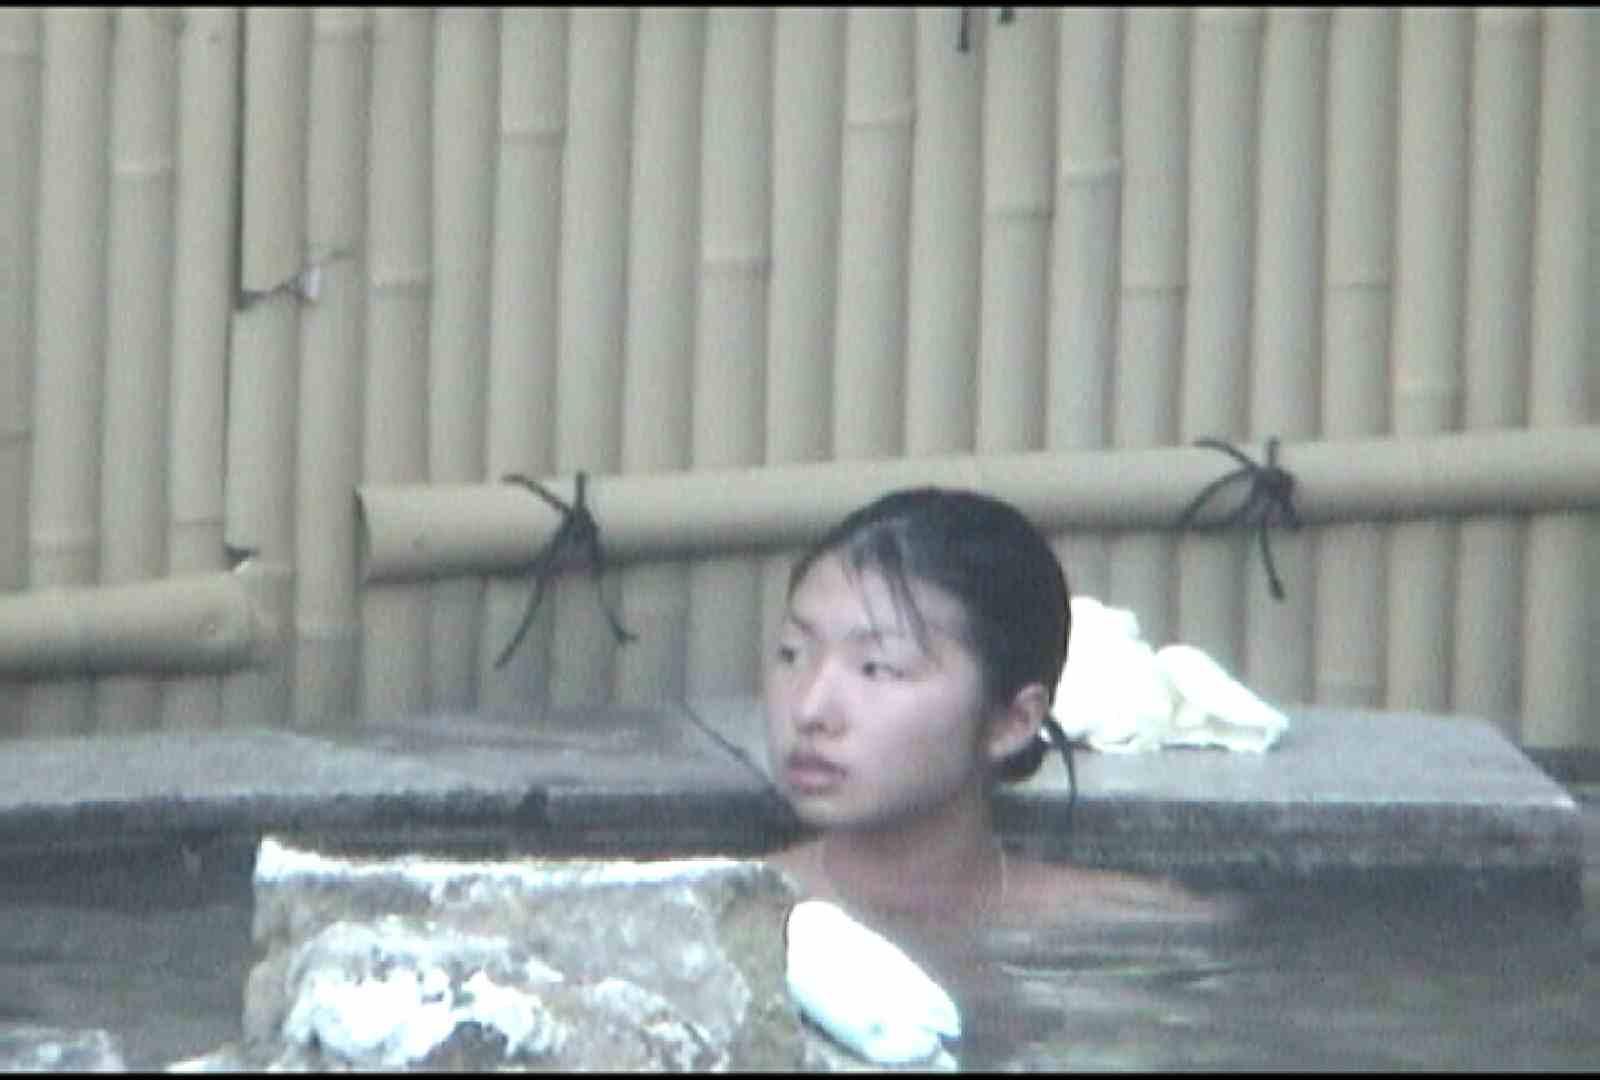 Aquaな露天風呂Vol.15 盗撮映像  42Pix 17